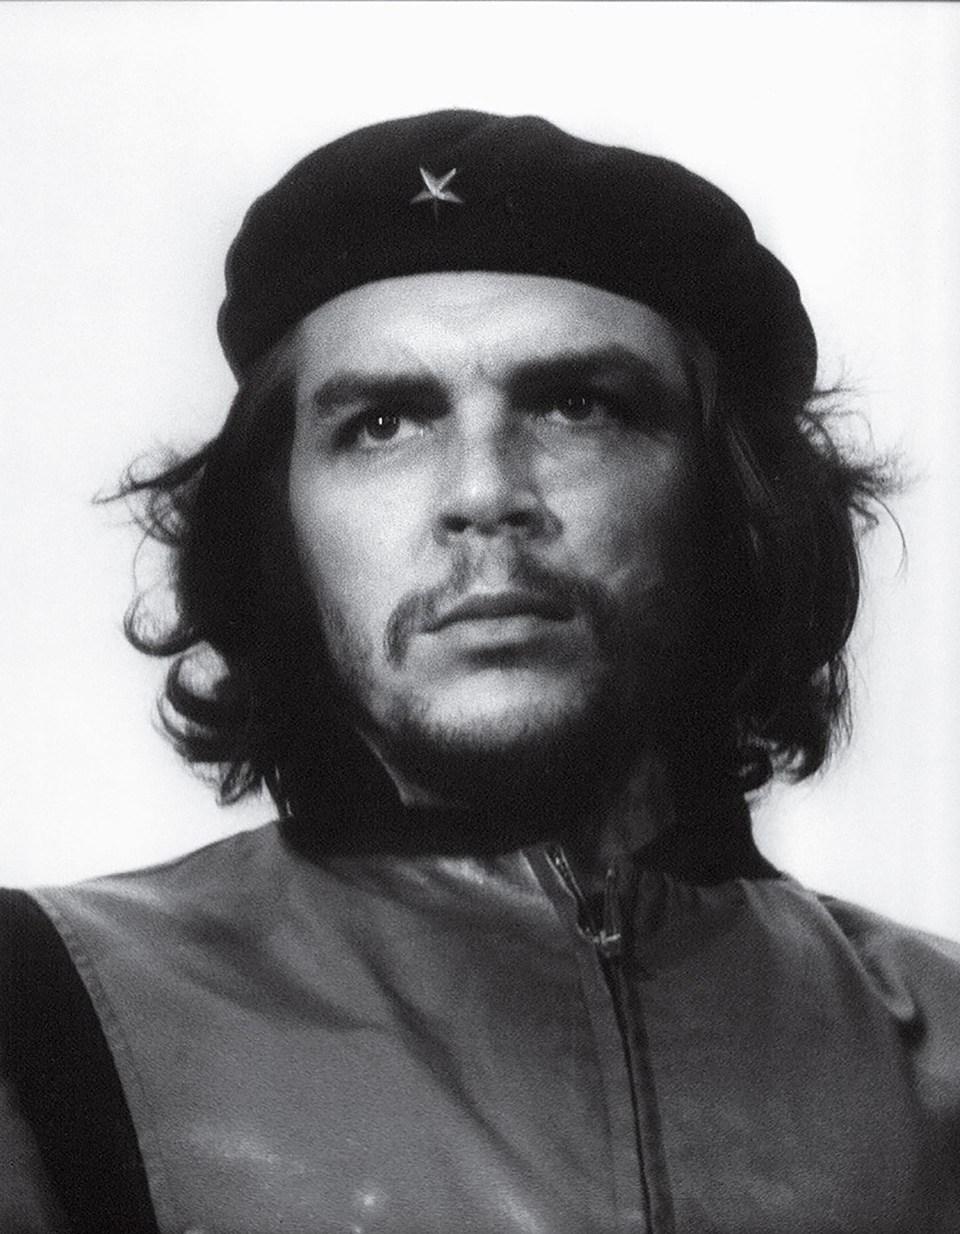 """Guerrillero heroico"" (Alberto Korda, Cuba, 1960)"